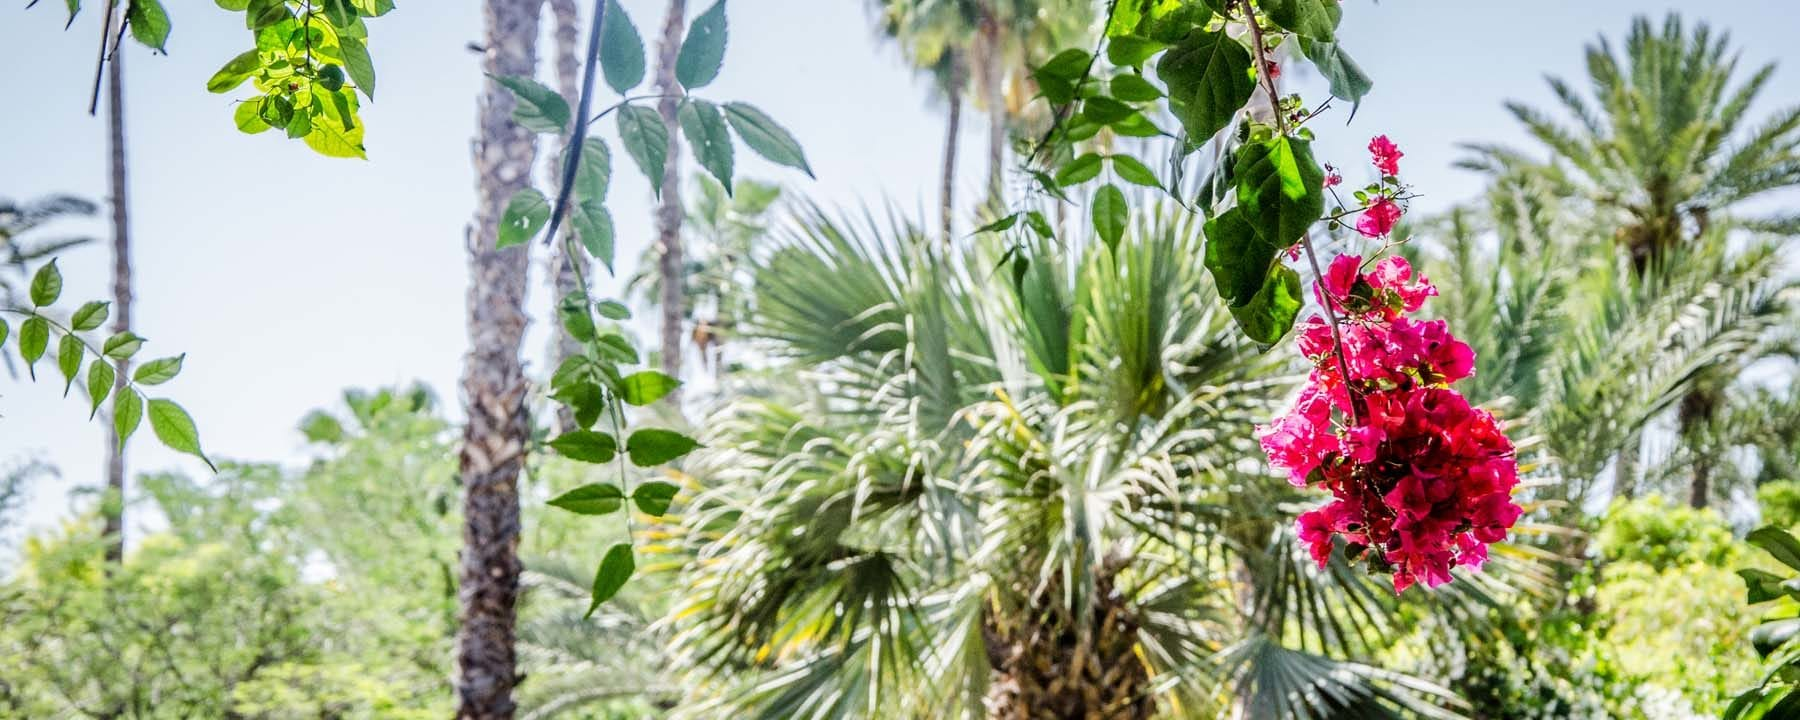 Yoga Green Marrakech_iStock 82993773